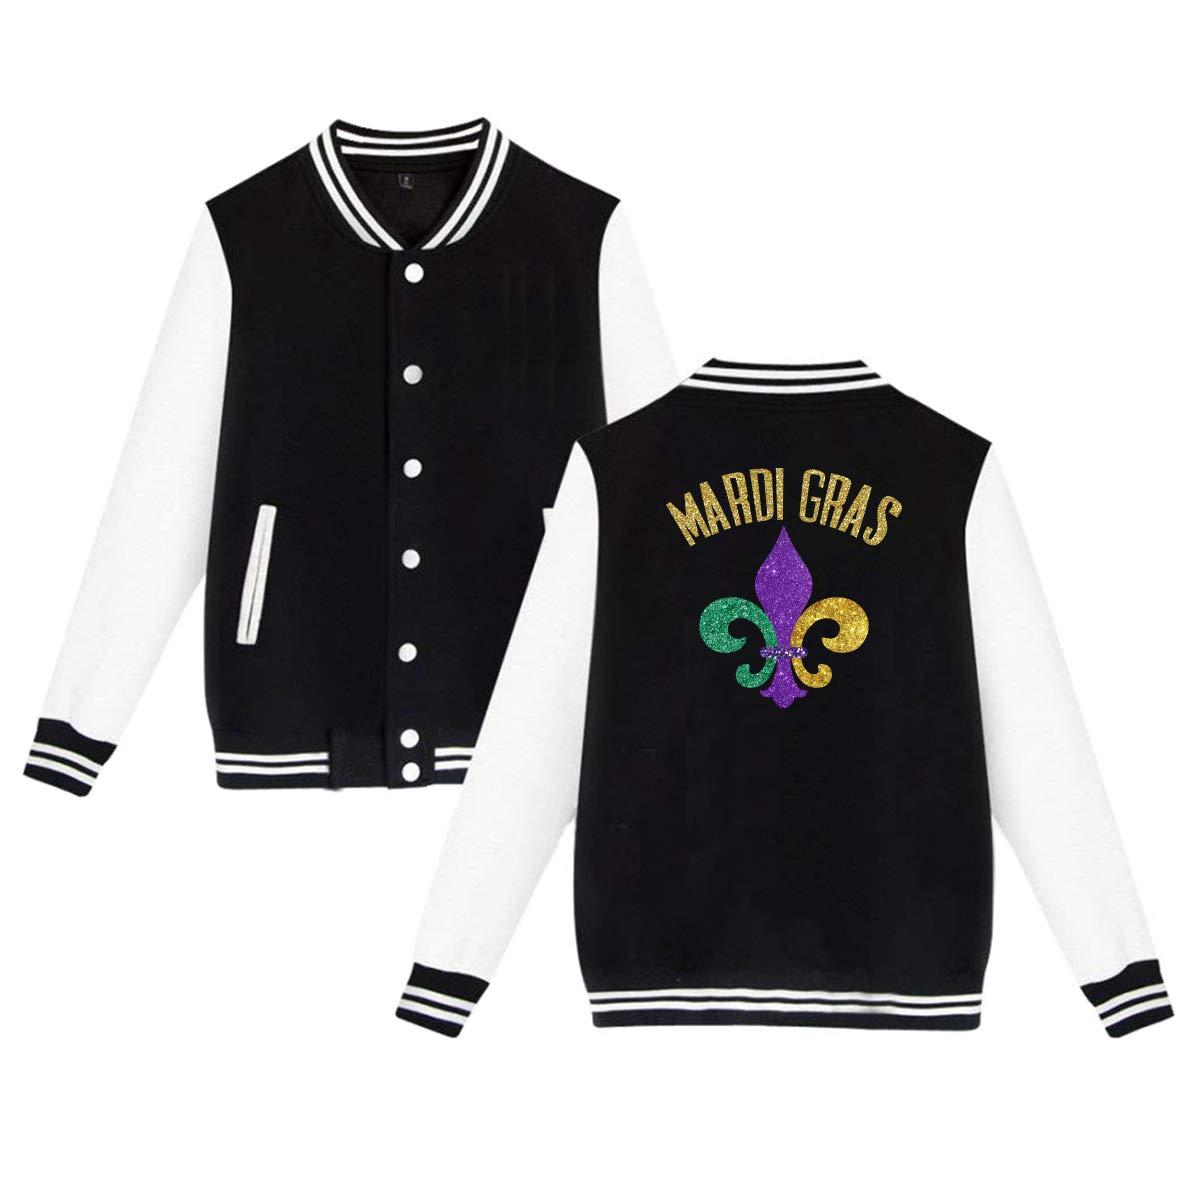 Mardi Gras Fleur De Lis Glitter Baseball Jacket Uniform Unisex Sweater Coat